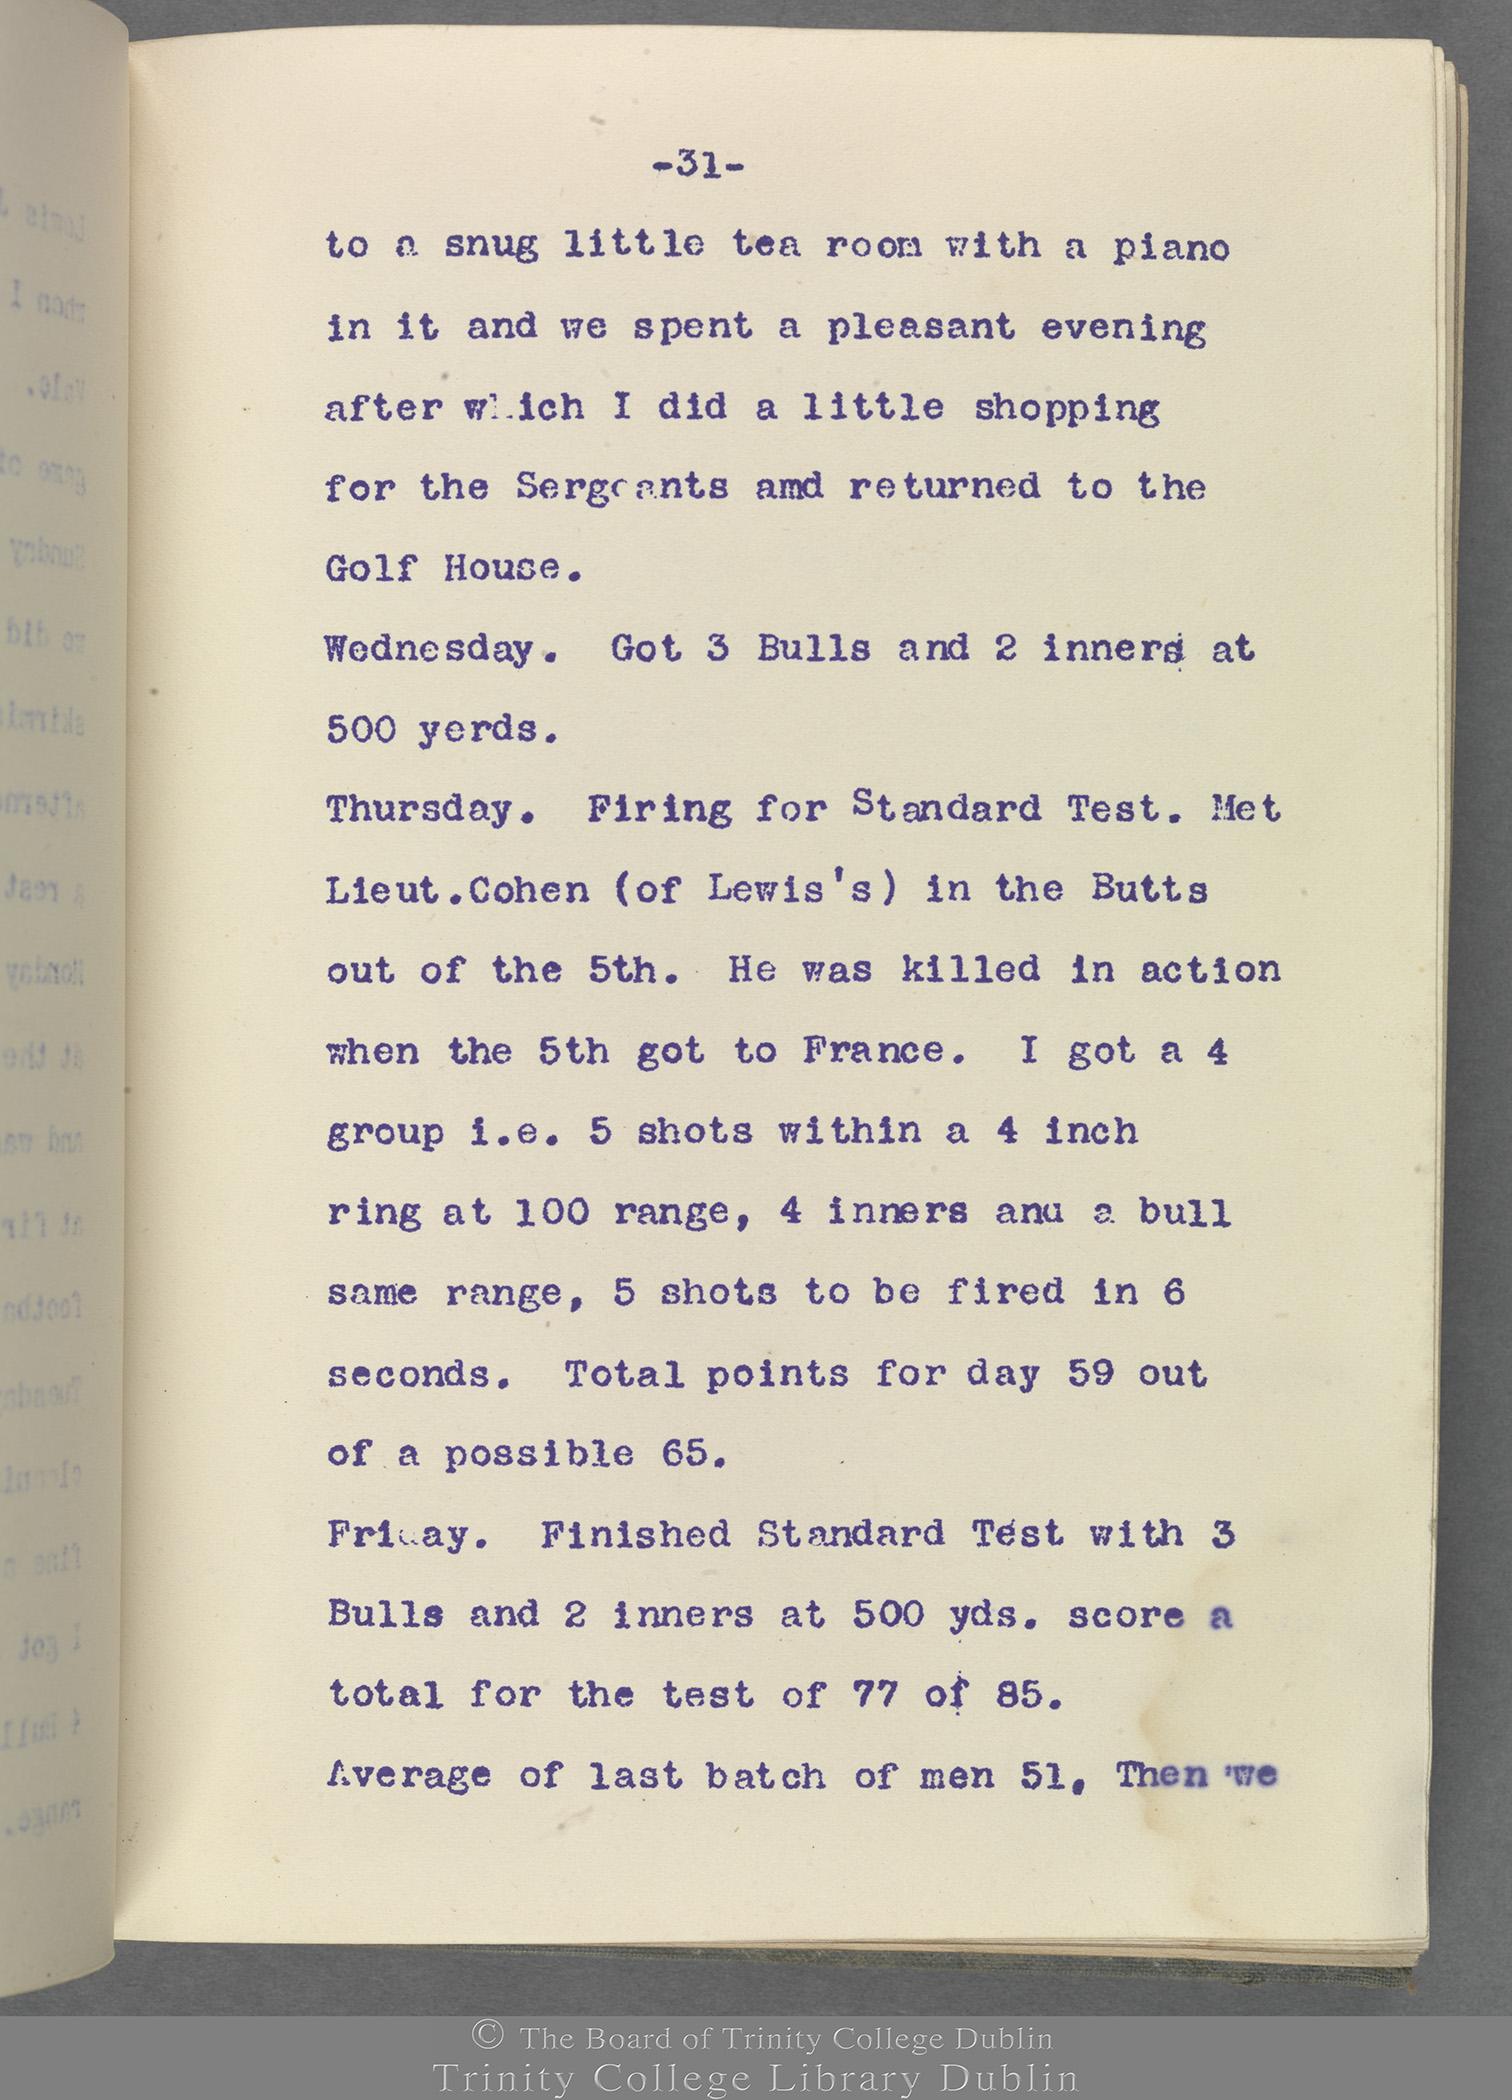 TCD MS 10853 folio 31 recto